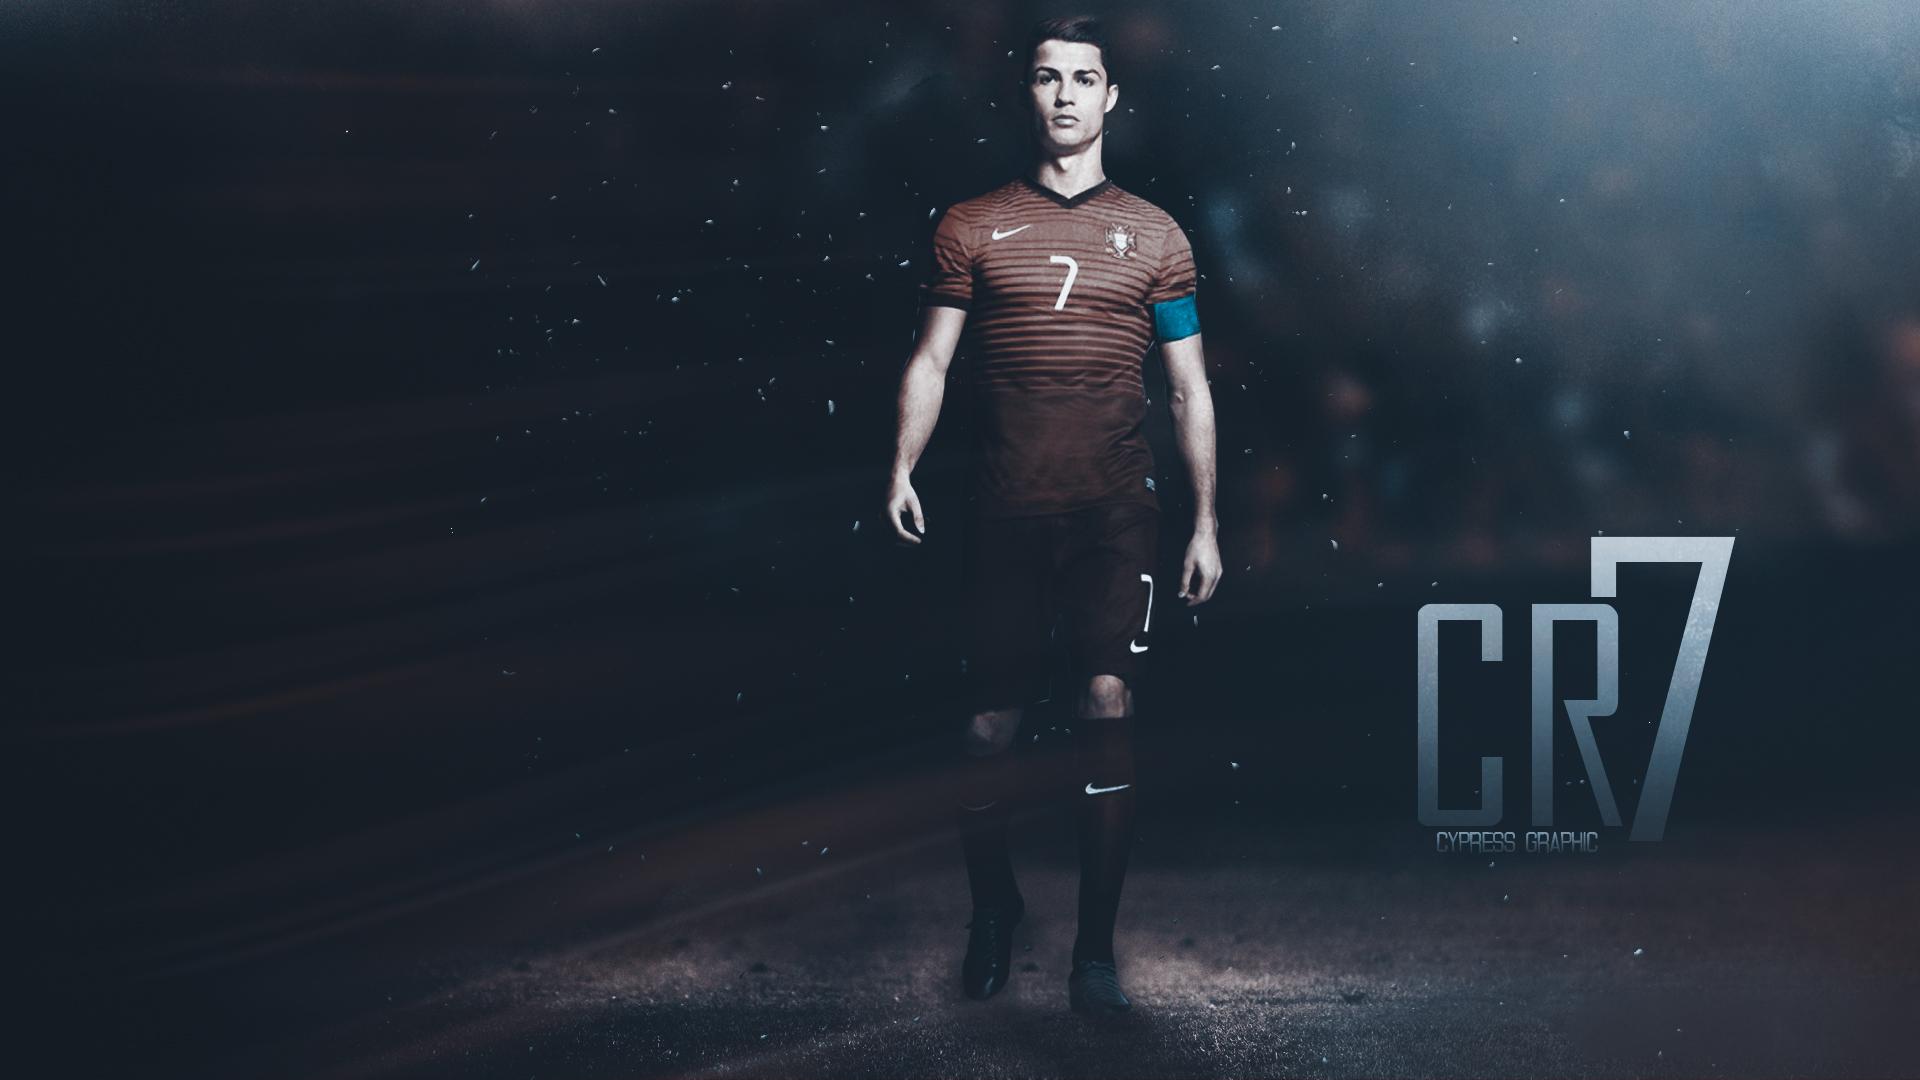 CR7 HD Wallpapers 1080p Ronaldo Download 1920x1080